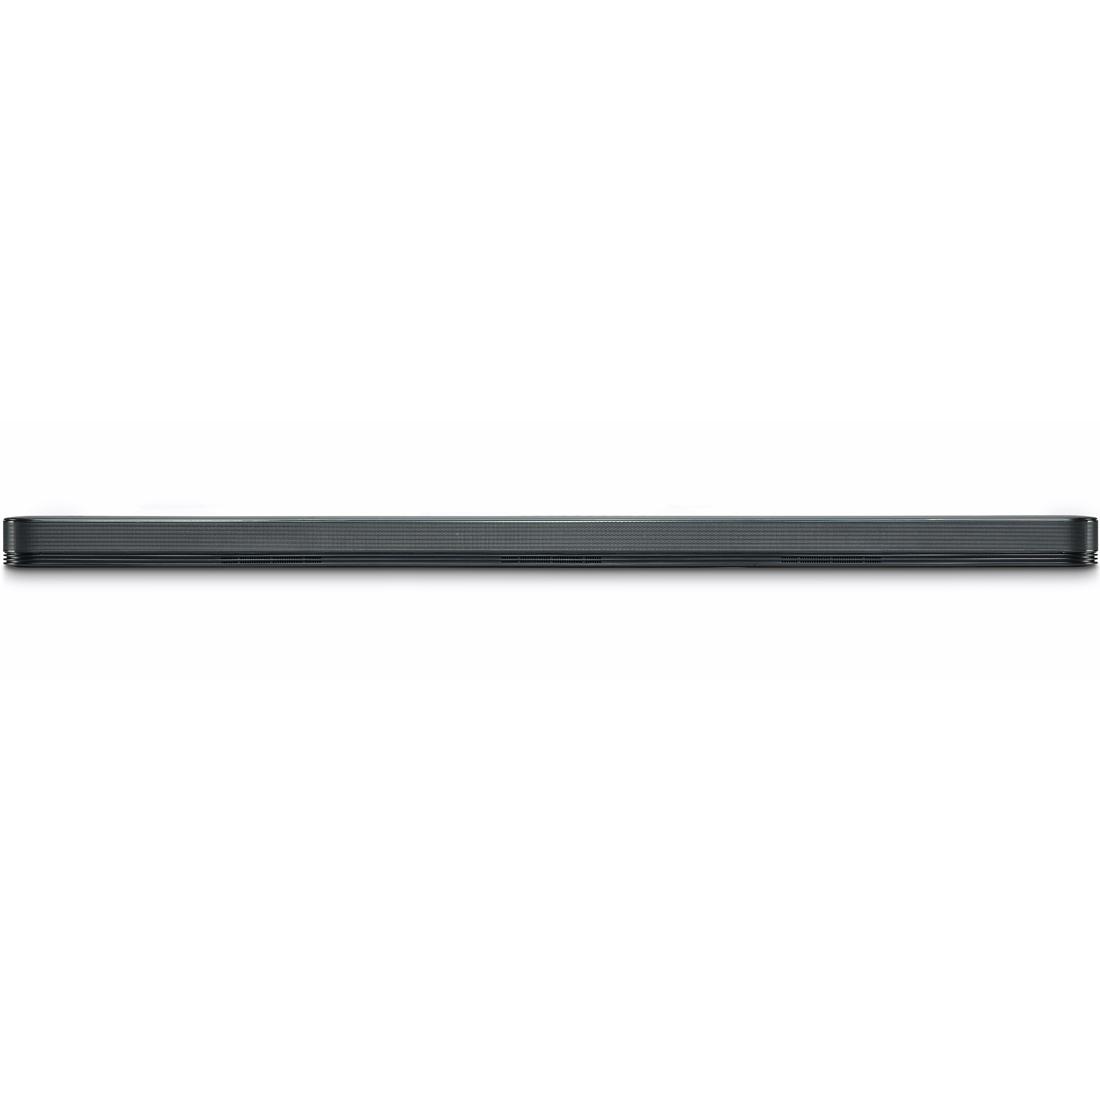 LG SK9Y 5 1 2 ch 500 W High Res Audio Sound Bar with Dolby Atmos